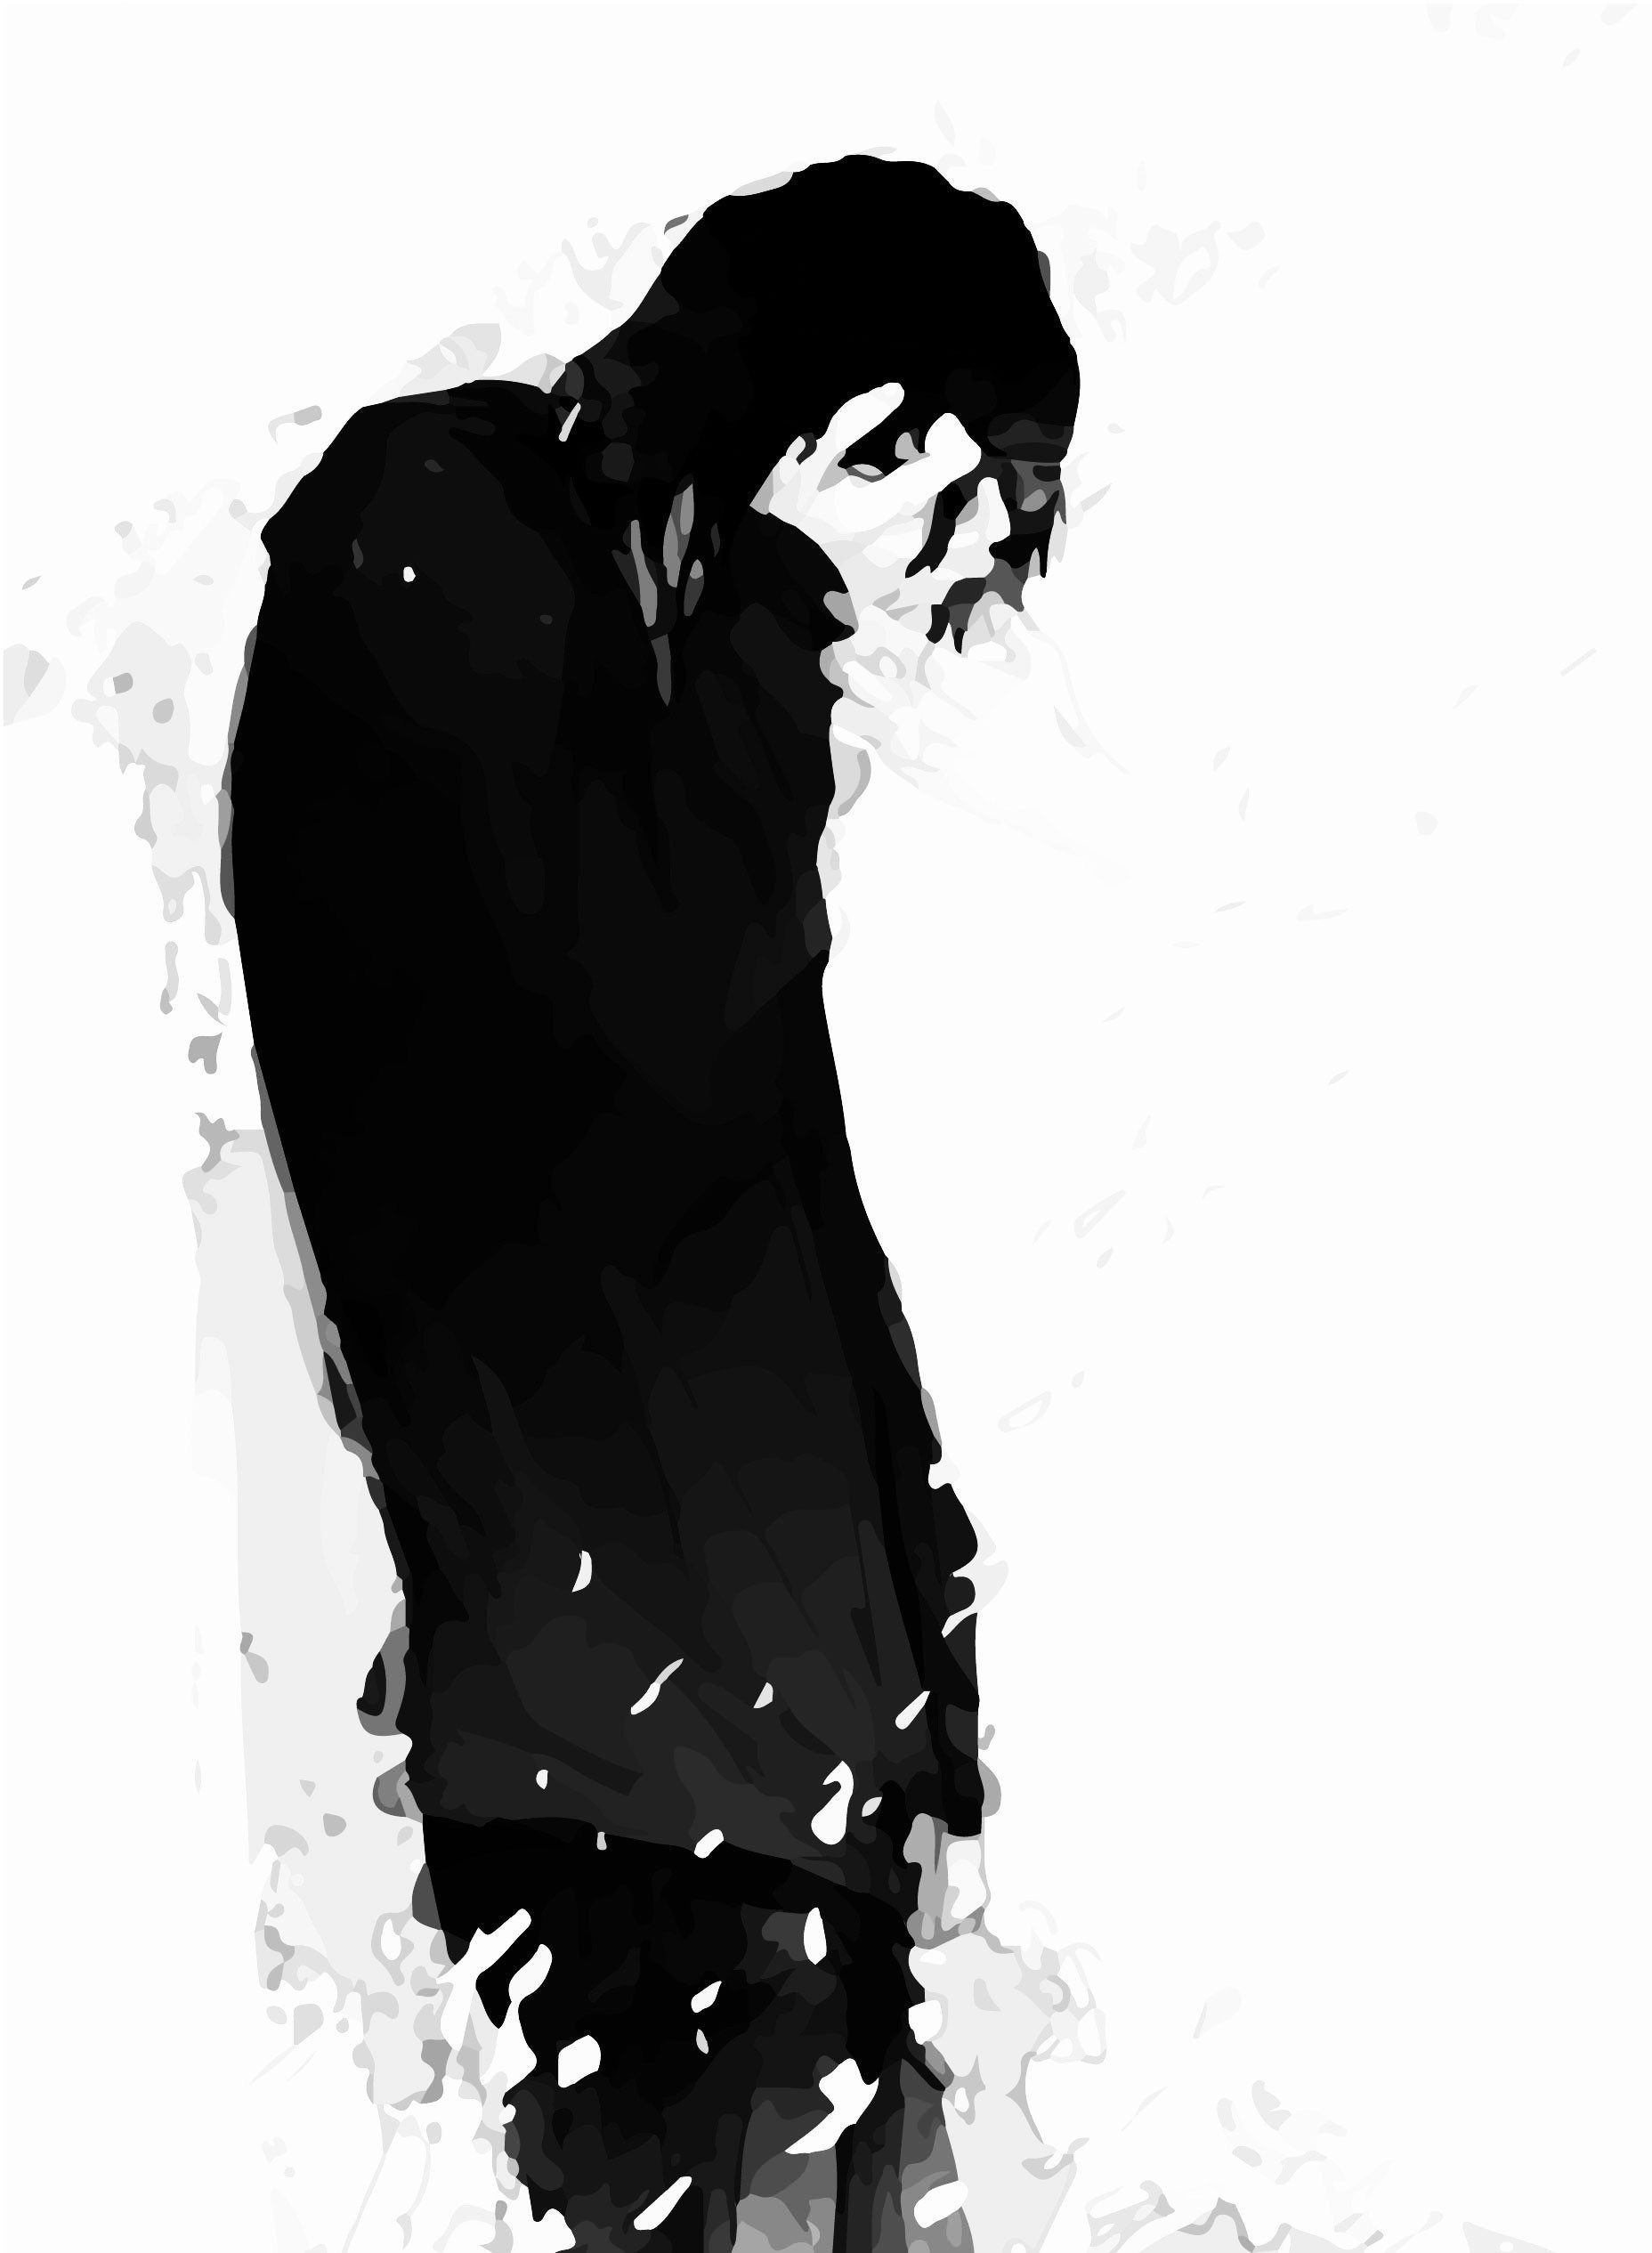 Broken Hearted Sad Anime Boy Wallpaper Anime Wallpaper Hd